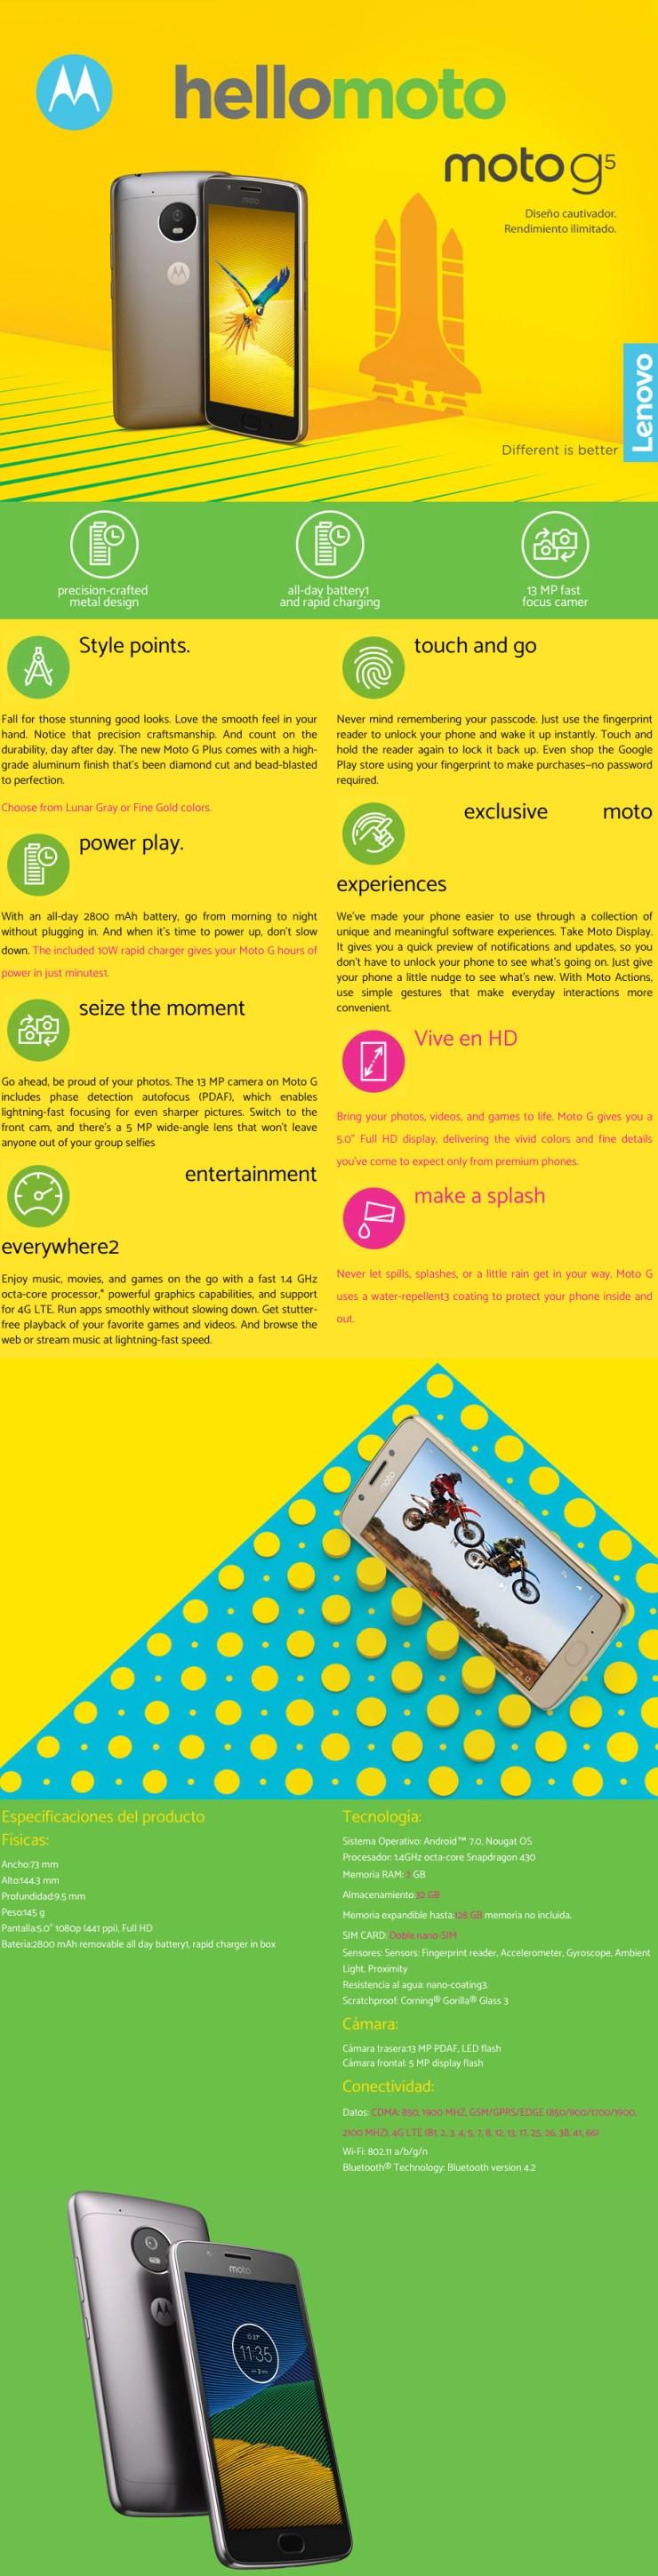 Moto G5 Poster